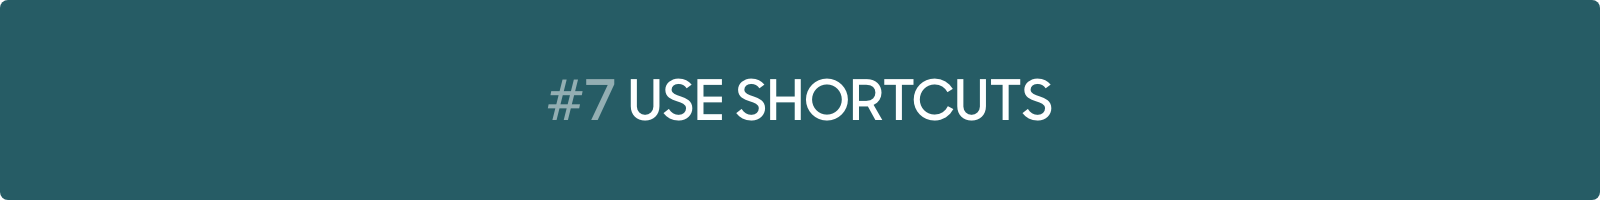 Conversational Marketing Tip #7: Use shortcuts